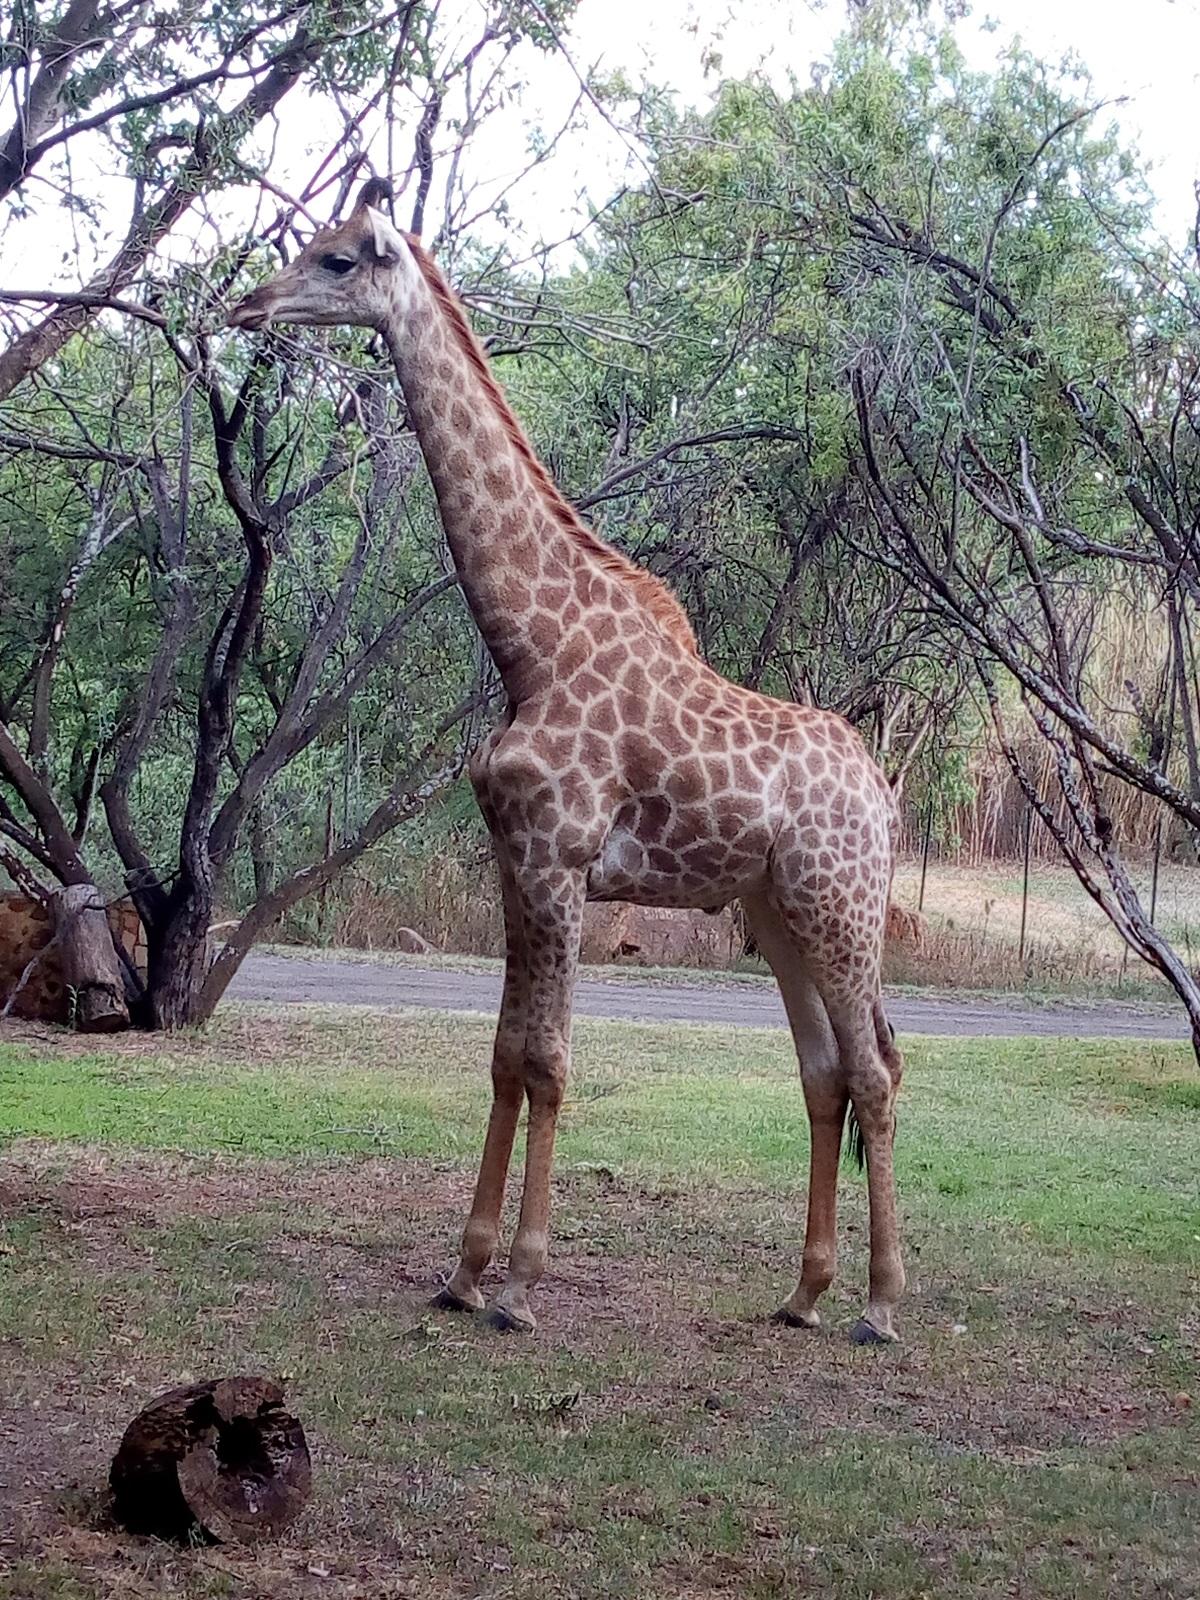 Mr. Giraffee is a resident of Farm Inn Hotel, Pretoria South Africa.